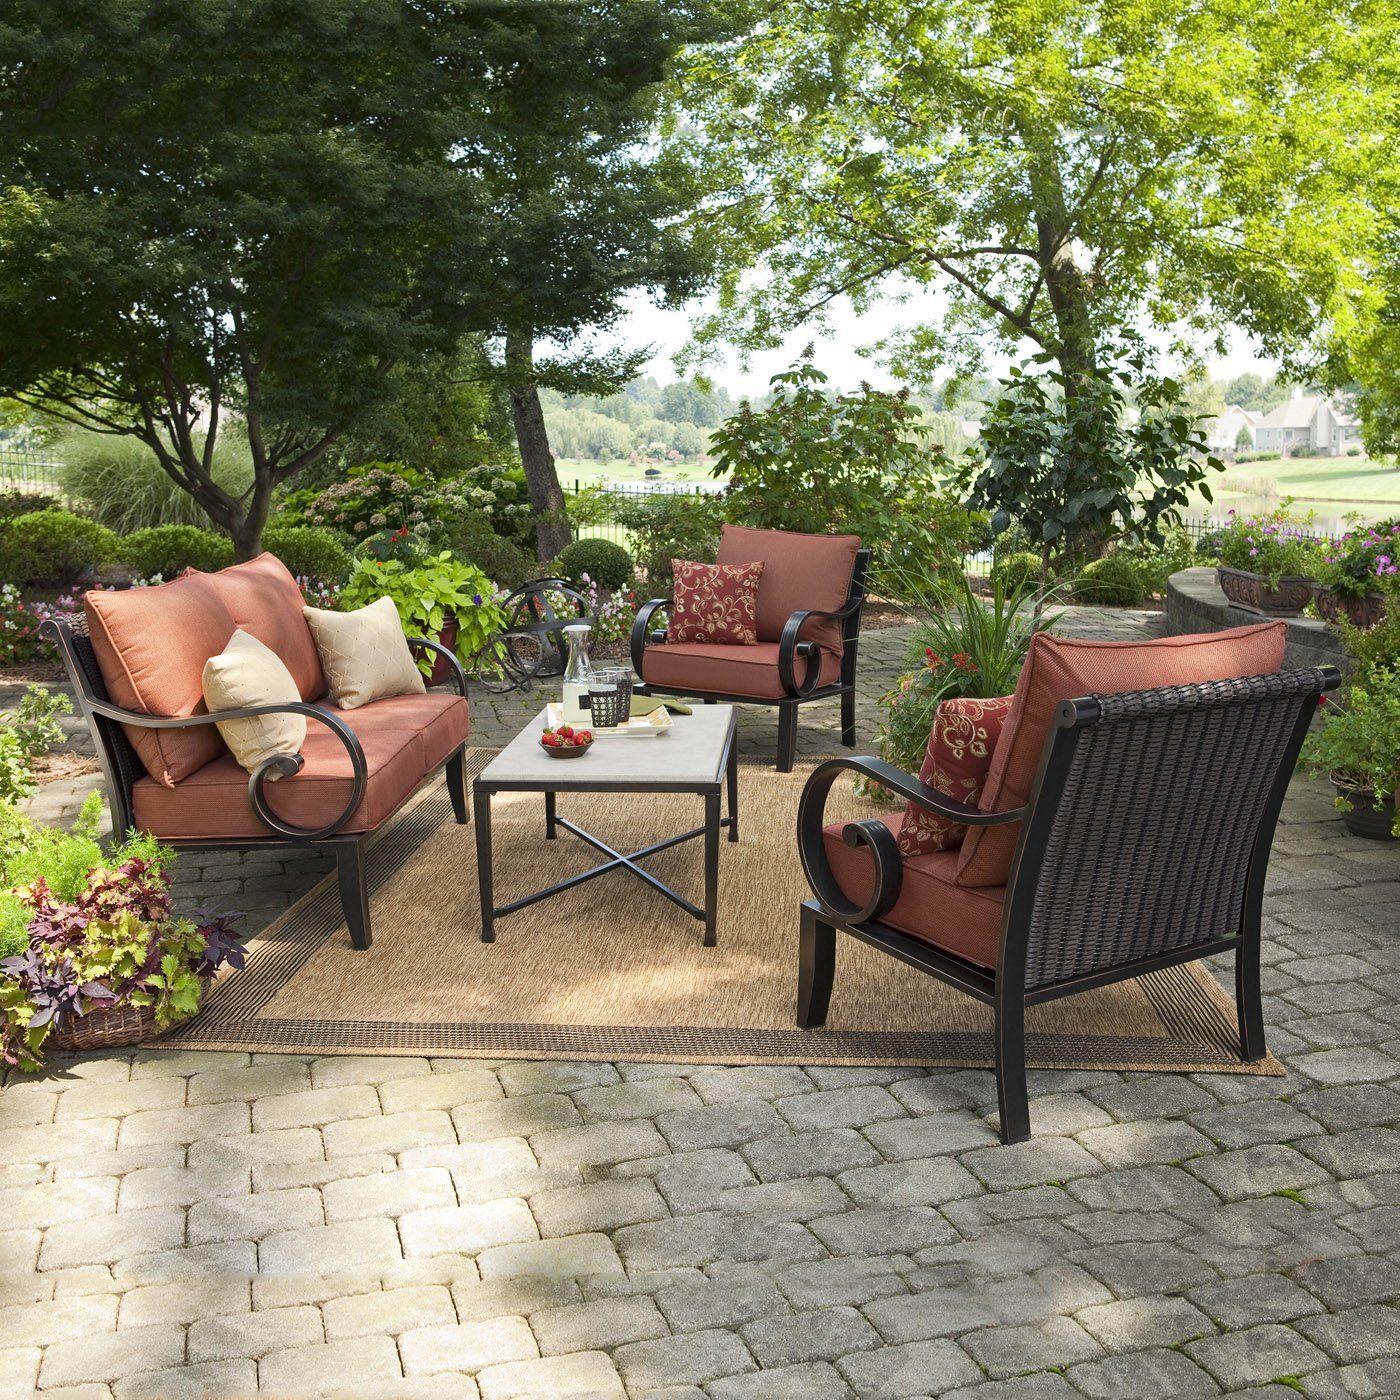 Allen Roth Pardini 4 Piece Outdoor Conversation Set Conversation Set Patio Red Patio Allen Roth Patio Furniture